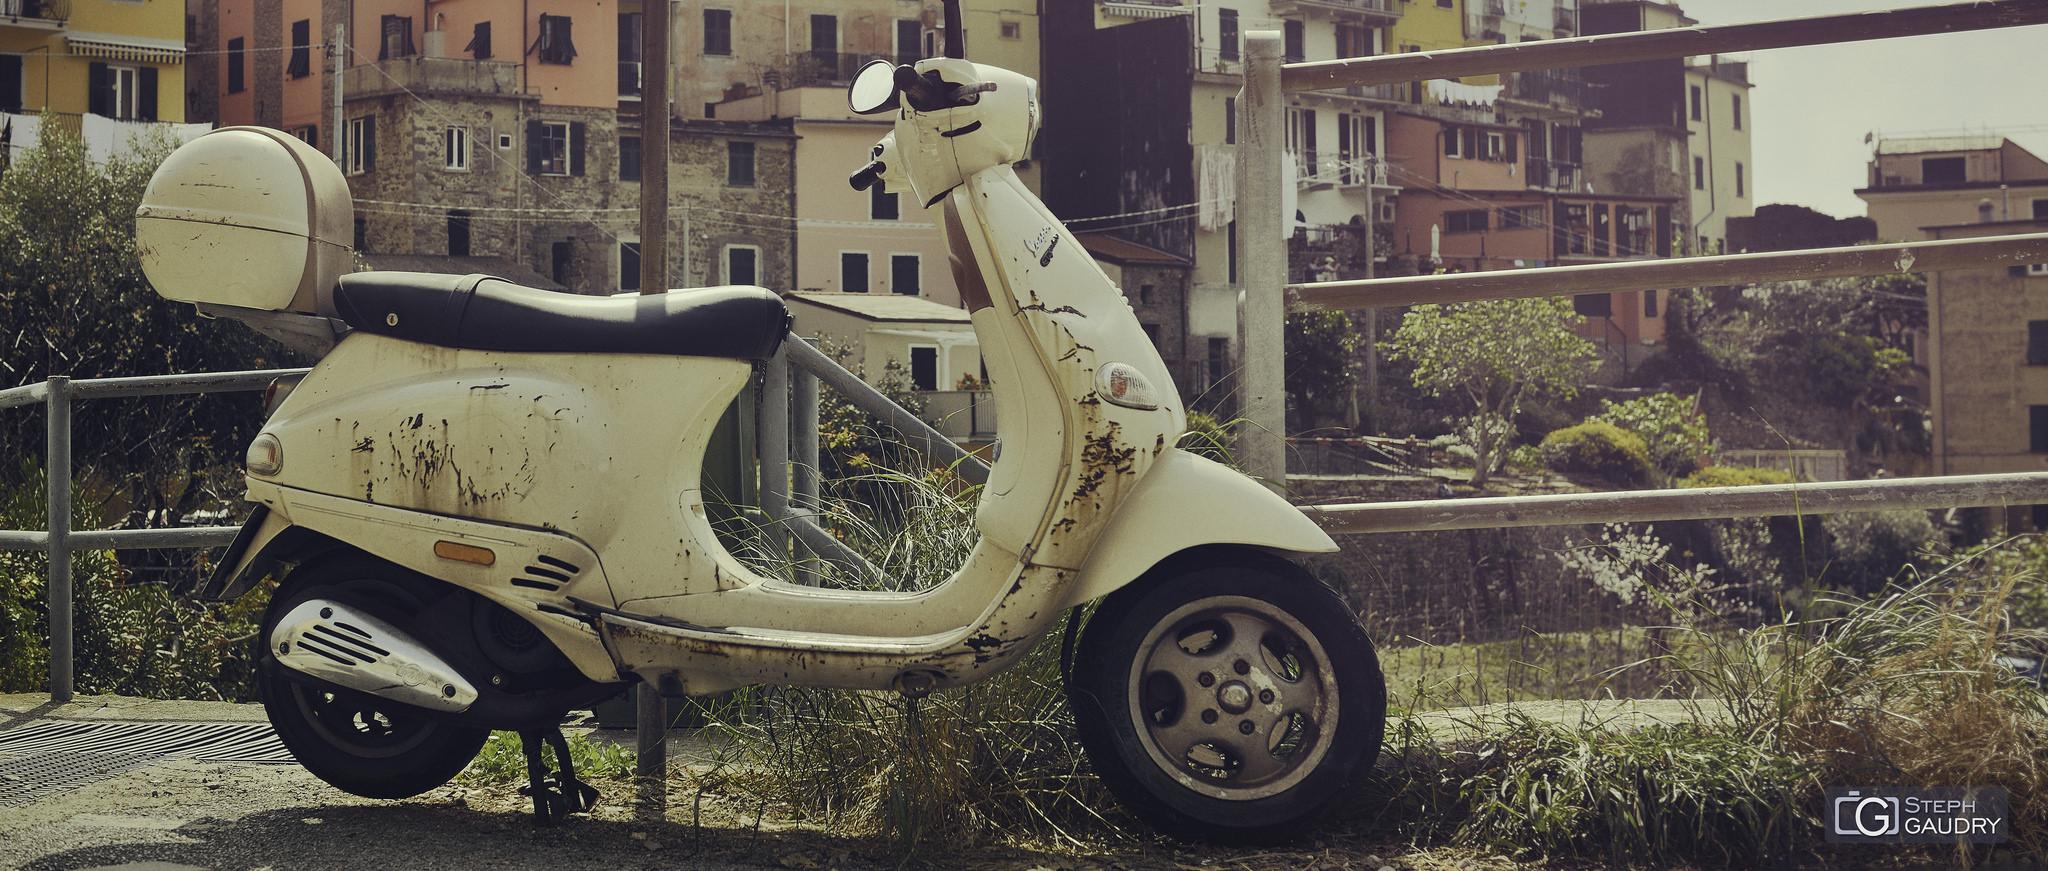 Liguria e Toscana dovrebbero essere visitati in Vespa [Click to start slideshow]